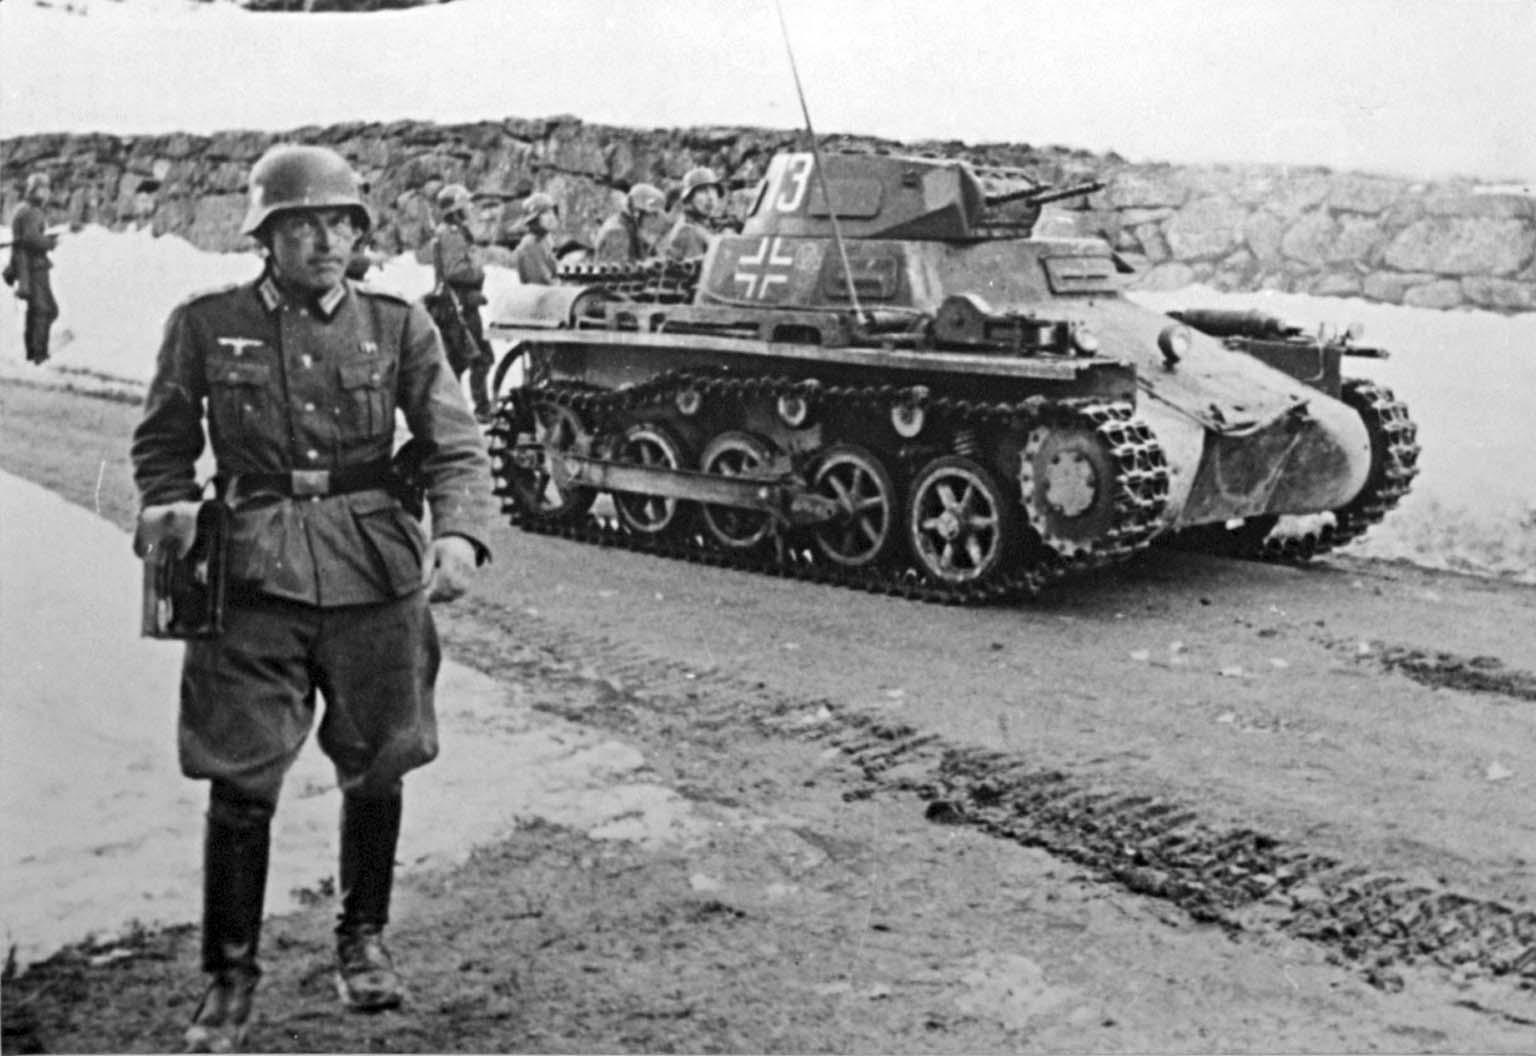 Herbert Stemmer, Panzer I